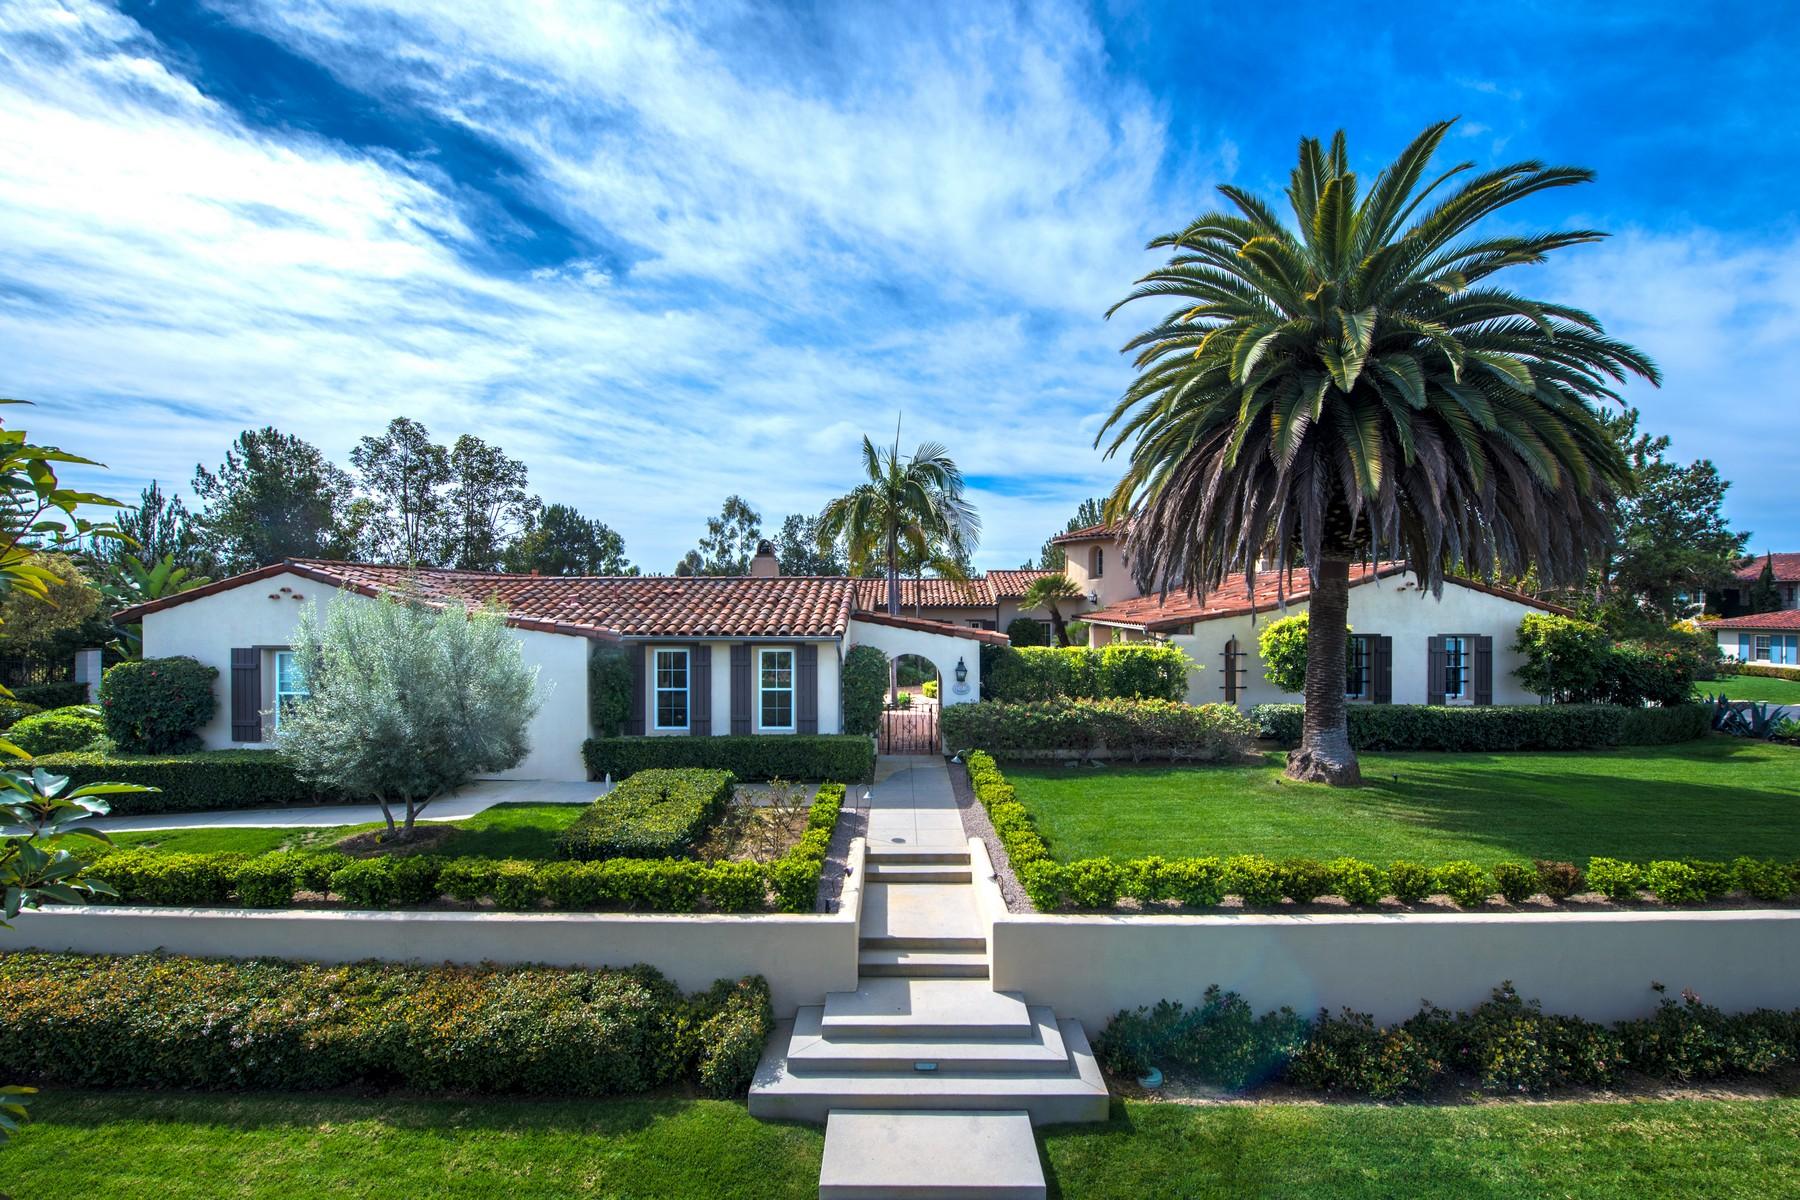 Single Family Home for Sale at 14146 Caminito Vistana San Diego, California, 92130 United States